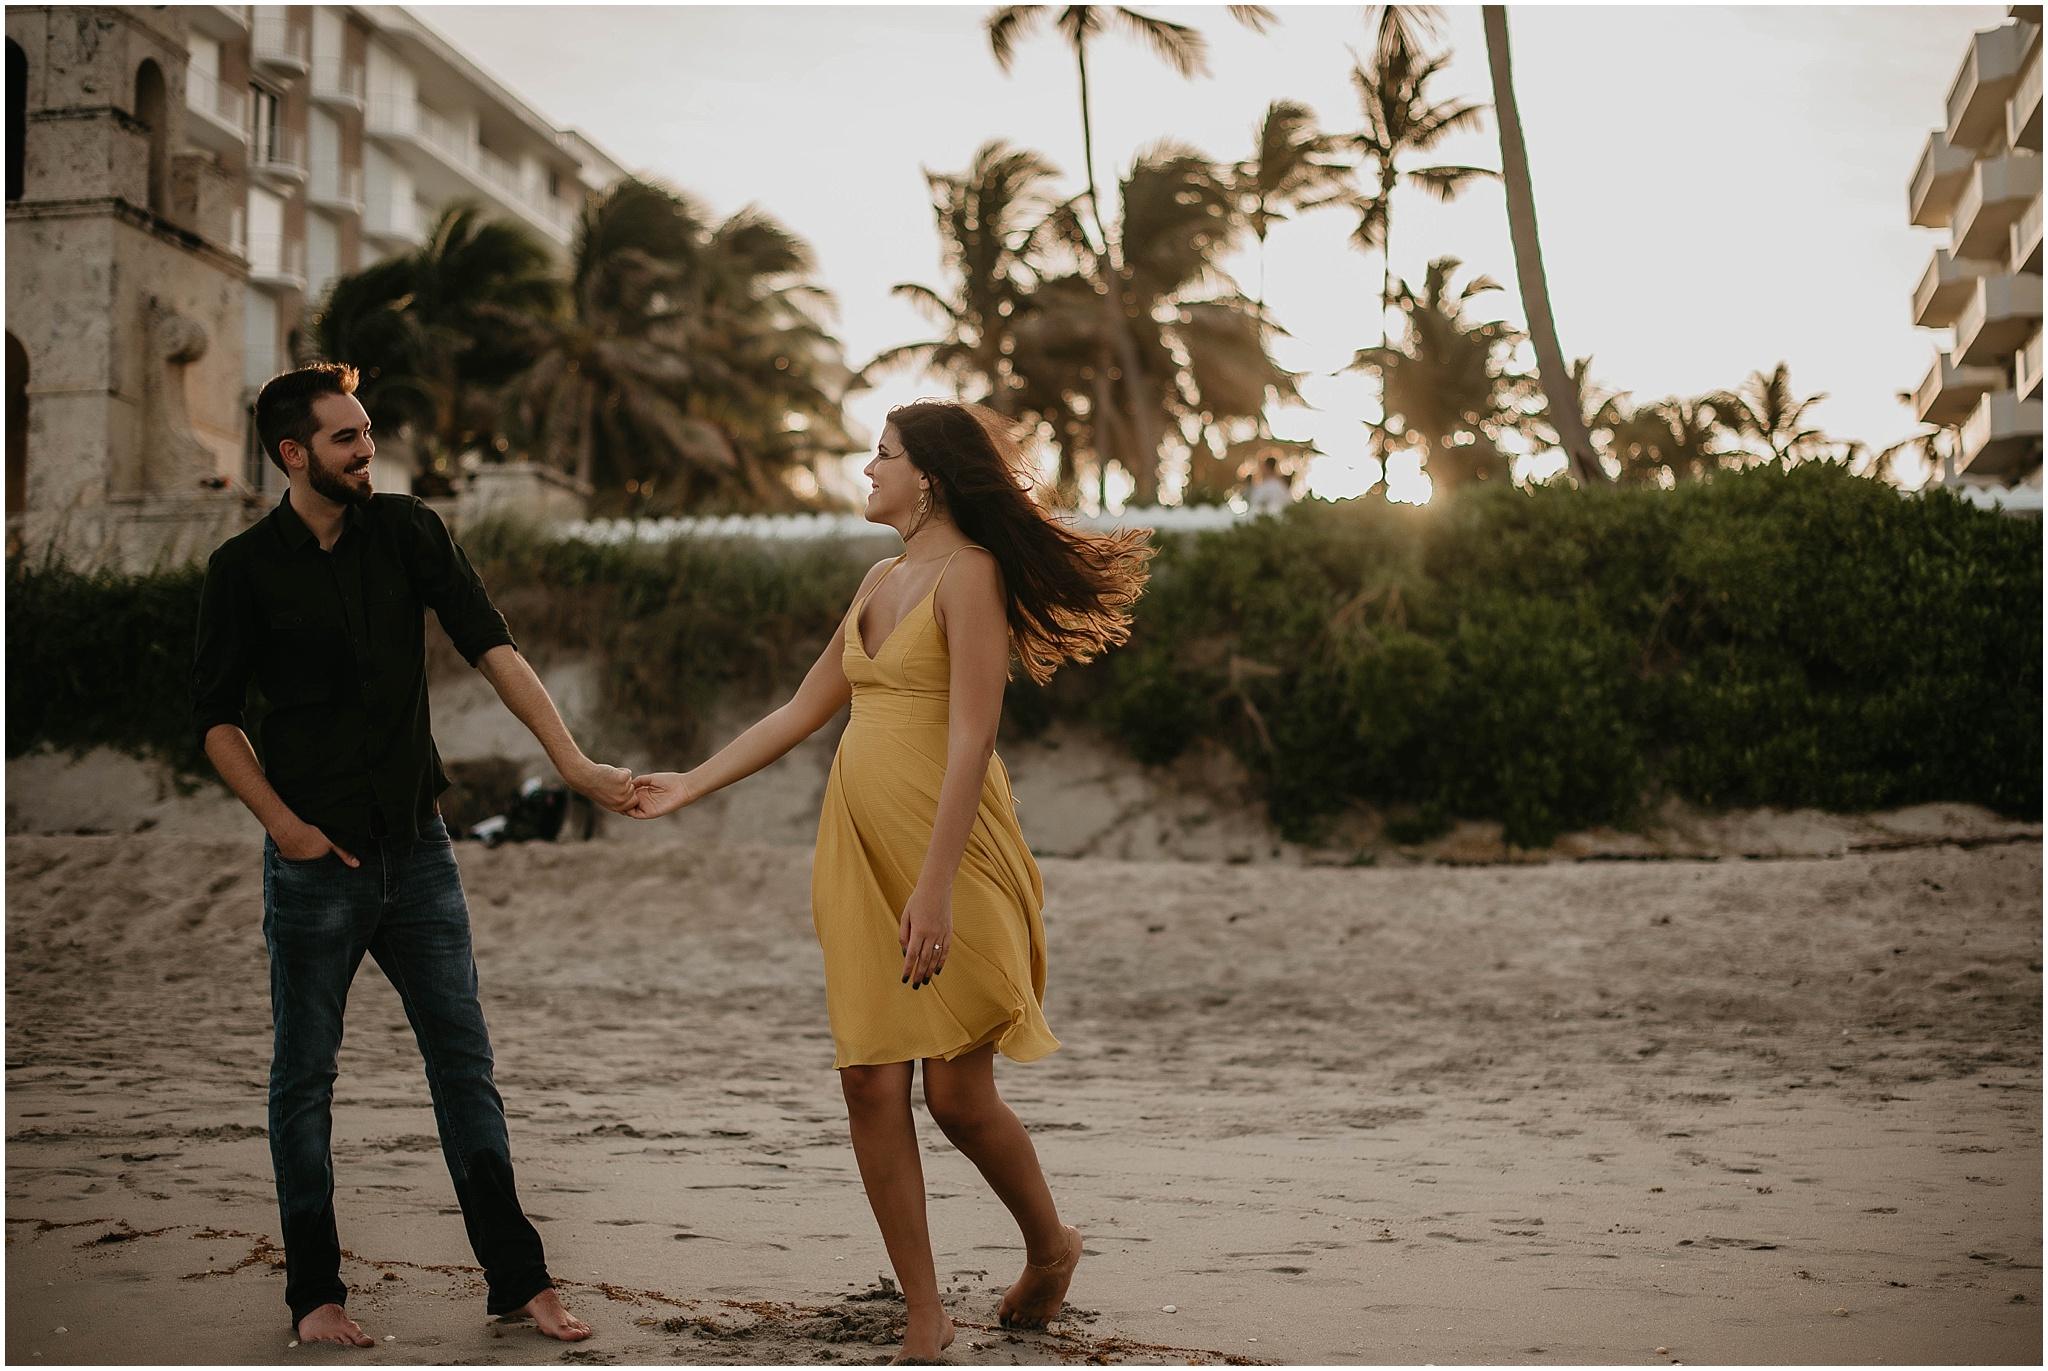 Worth-Avenue-Palm-Beach-engagement-photographer_0015.jpg